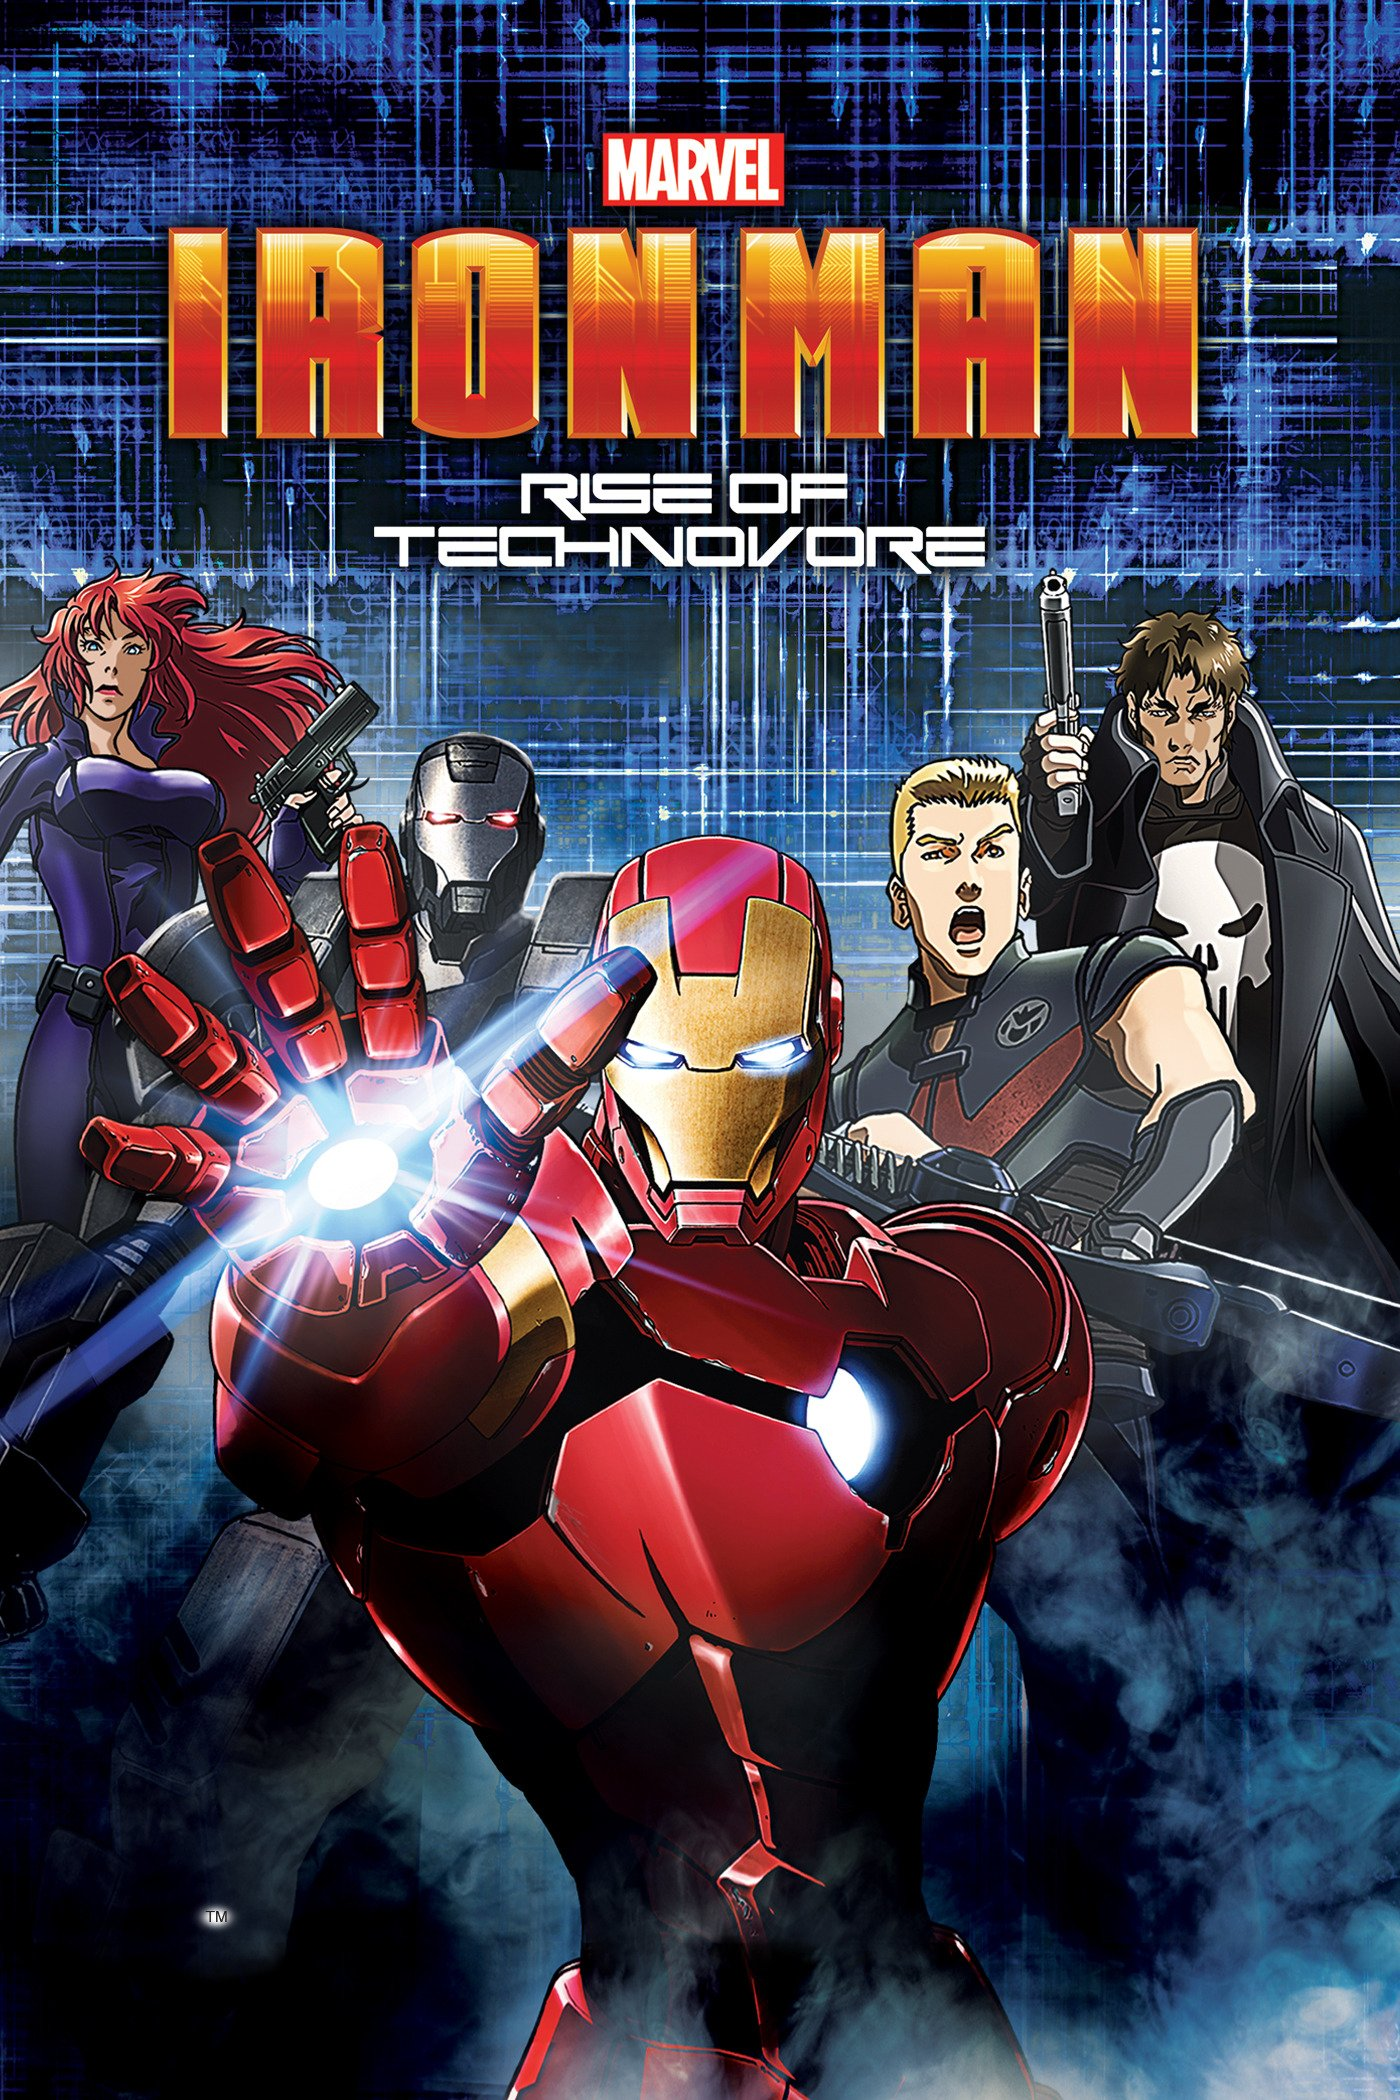 Iron Man: Rise of Technovore | Marvel Wiki | Fandom